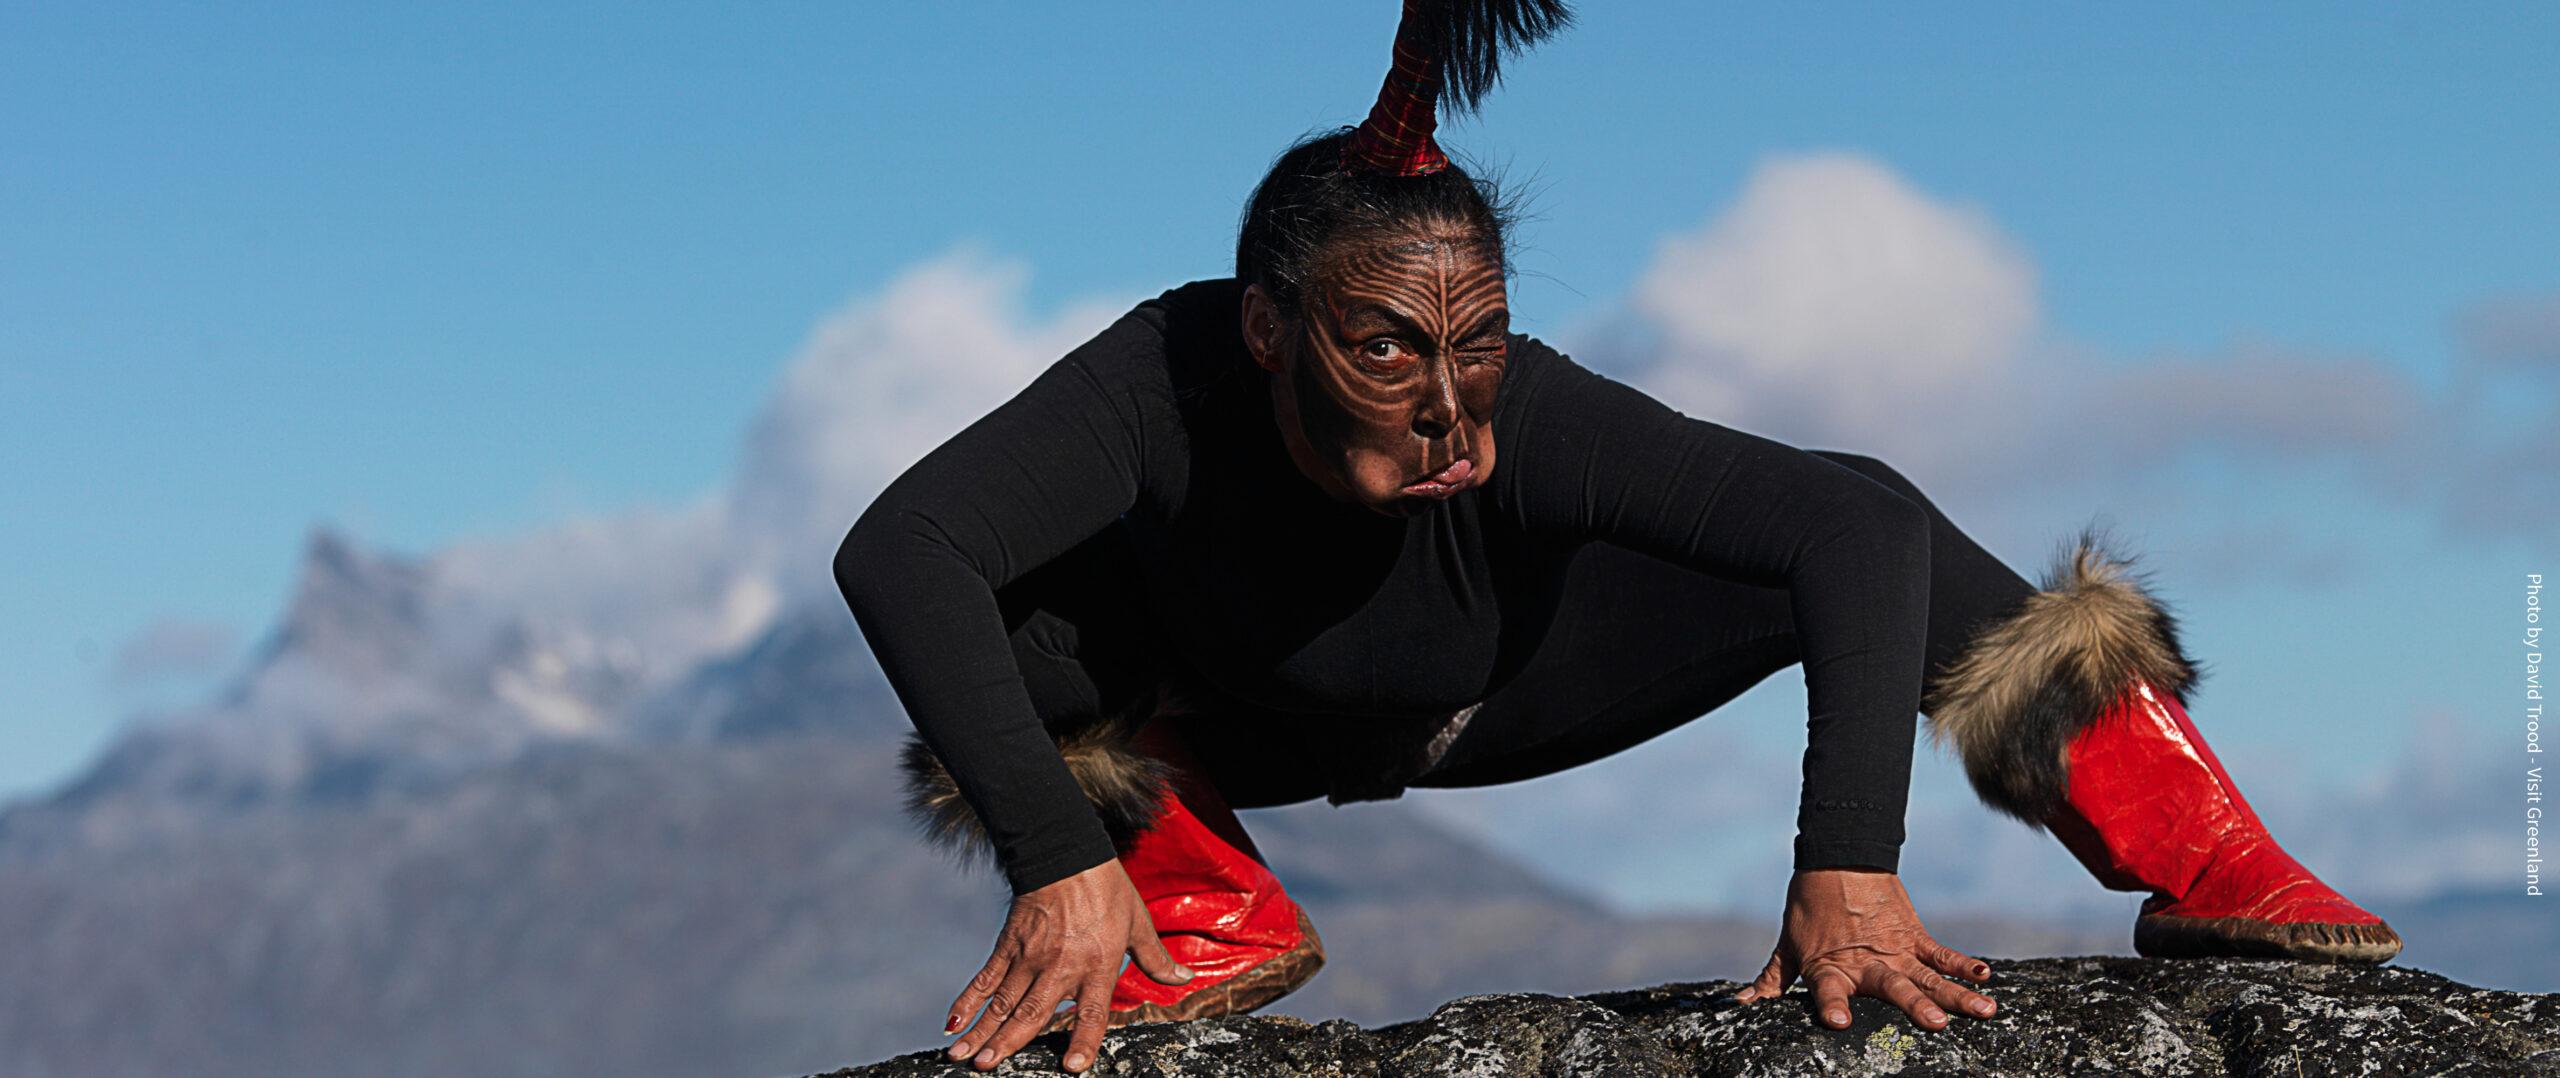 cultura groenlandia